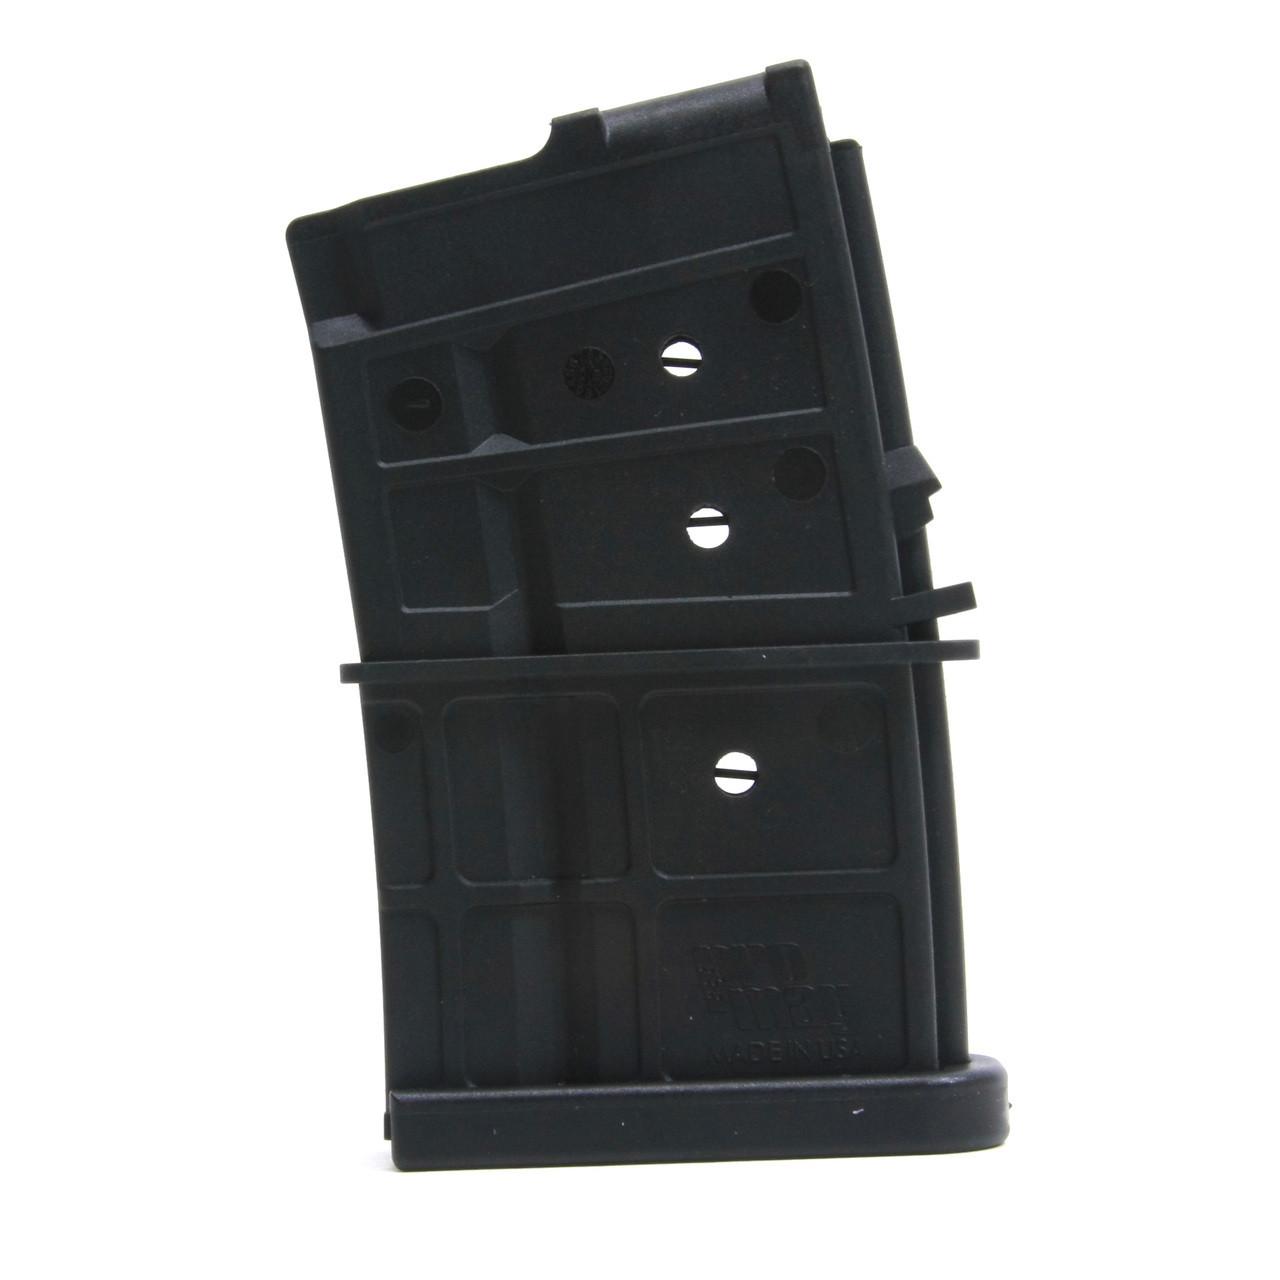 HK® SL8-6 .223 (10) Rd - Black Polymer